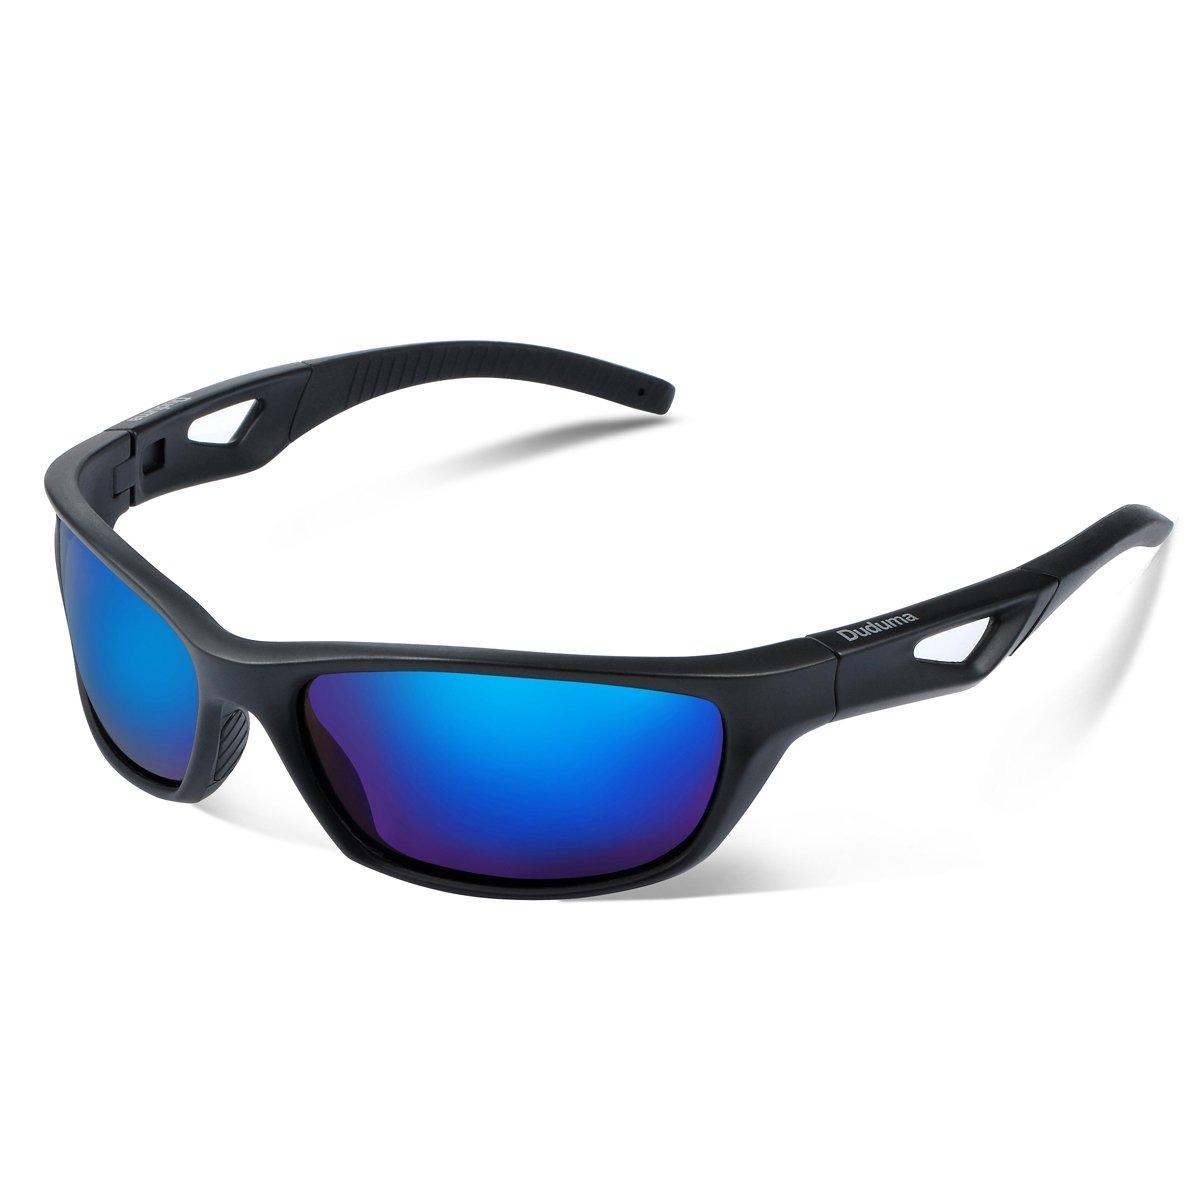 455d80d664 duduma polarized sports sunglasses para hombres mujeres béi. Cargando zoom.